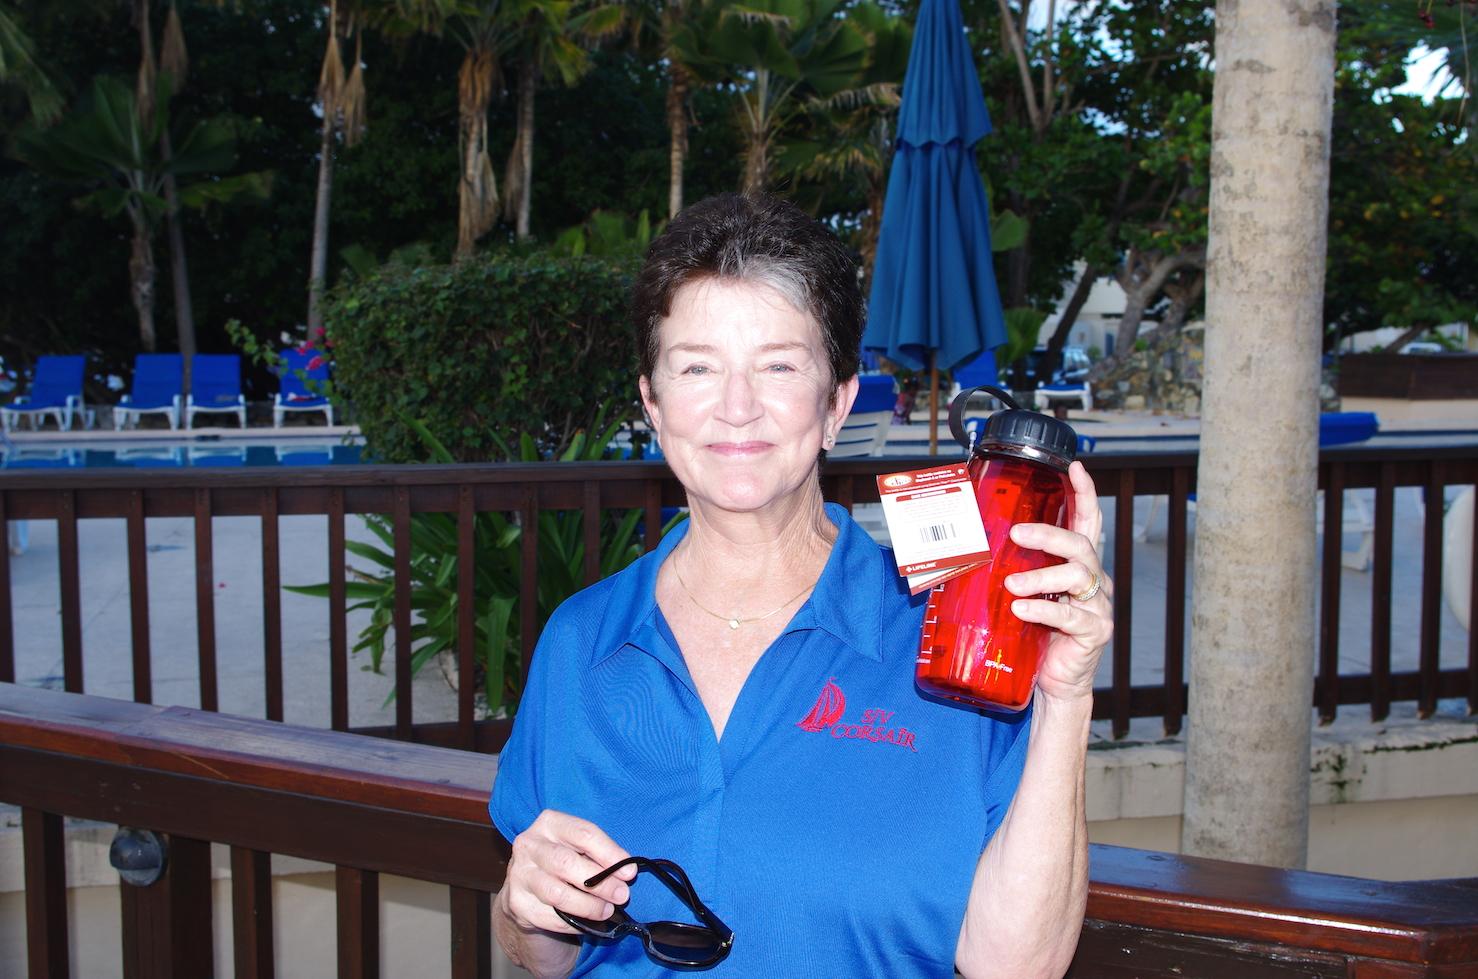 2014_C1500_Nanny Cay_Prizegiving_Best Bruise winner_Cricket on Corsair.JPG